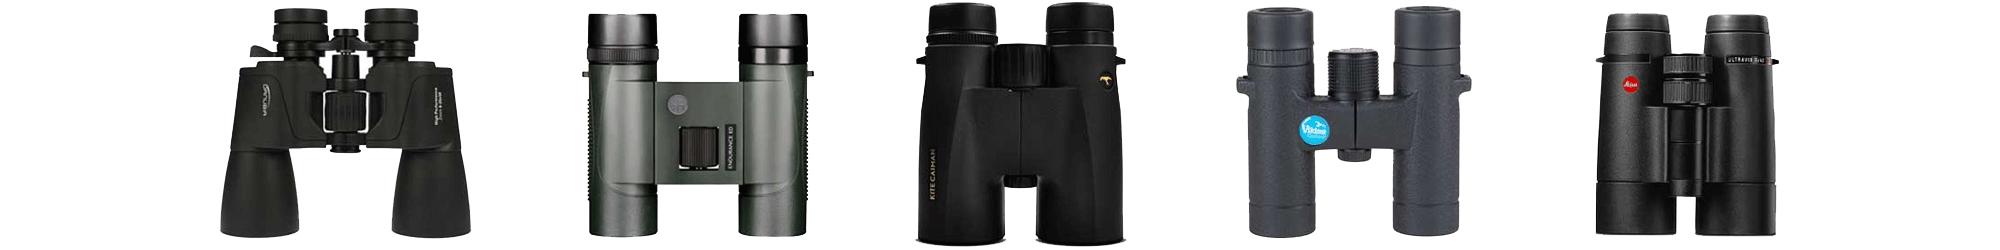 Binoculars from Harrison Cameras